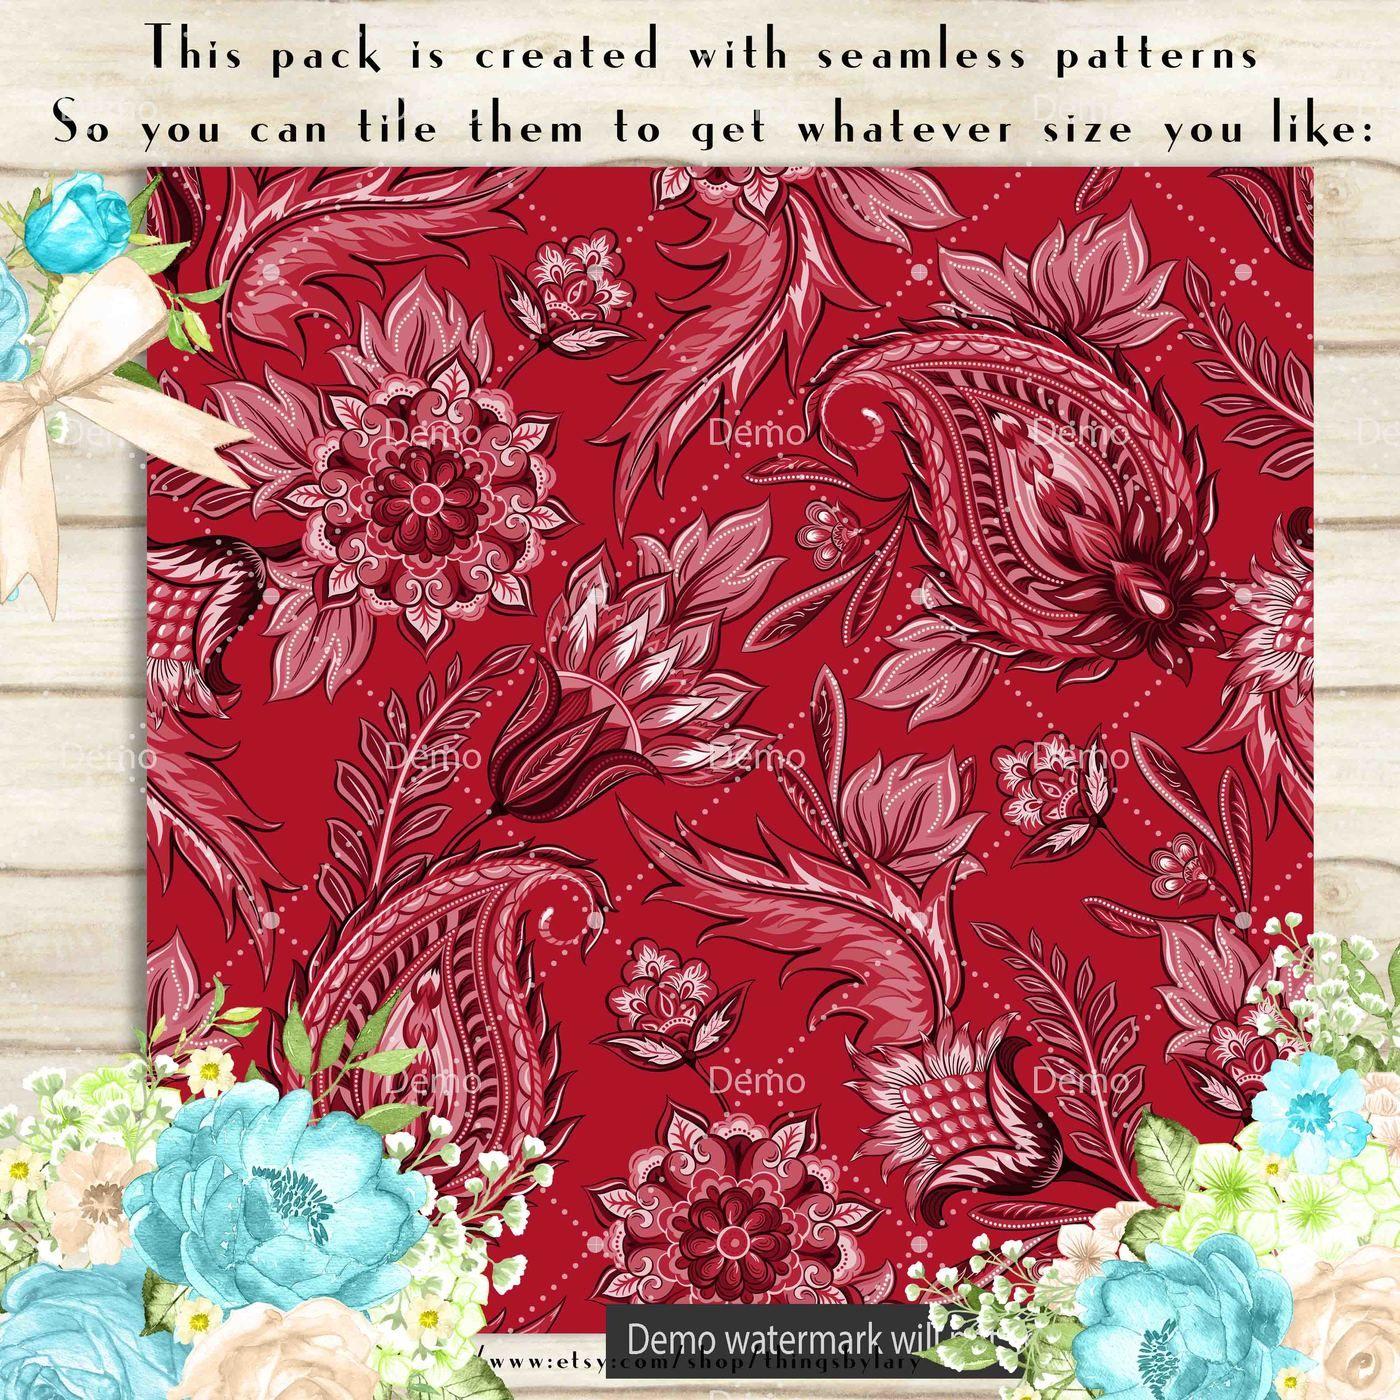 100 Seamless Floral Paisley Digital Paper 12 X 12 Inch By Artinsider Thehungryjpeg Com